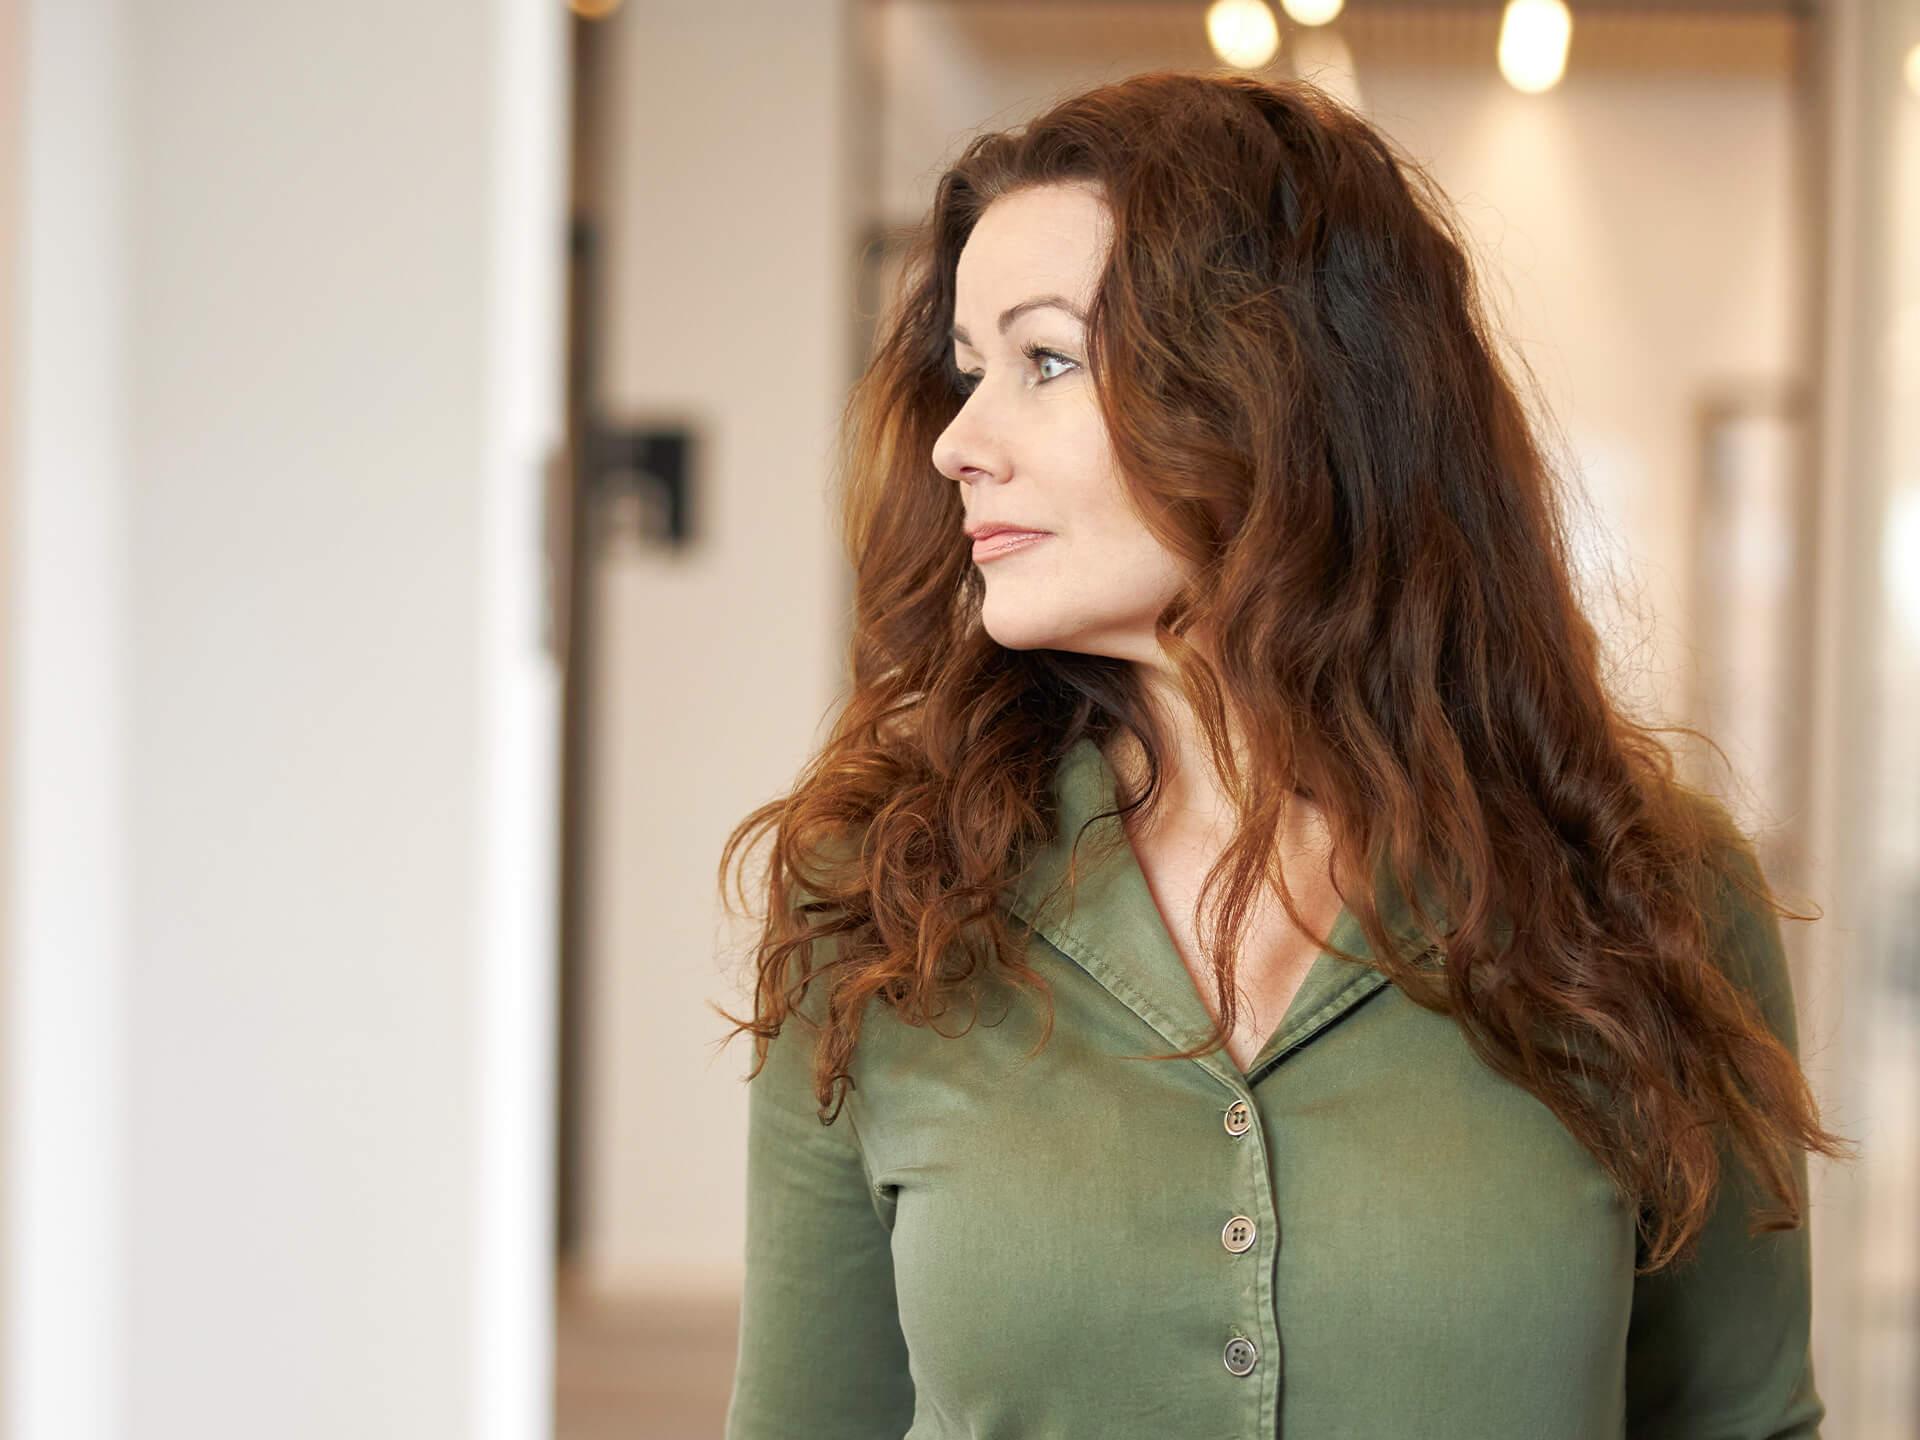 Agnes Hlíf Andrésdóttir